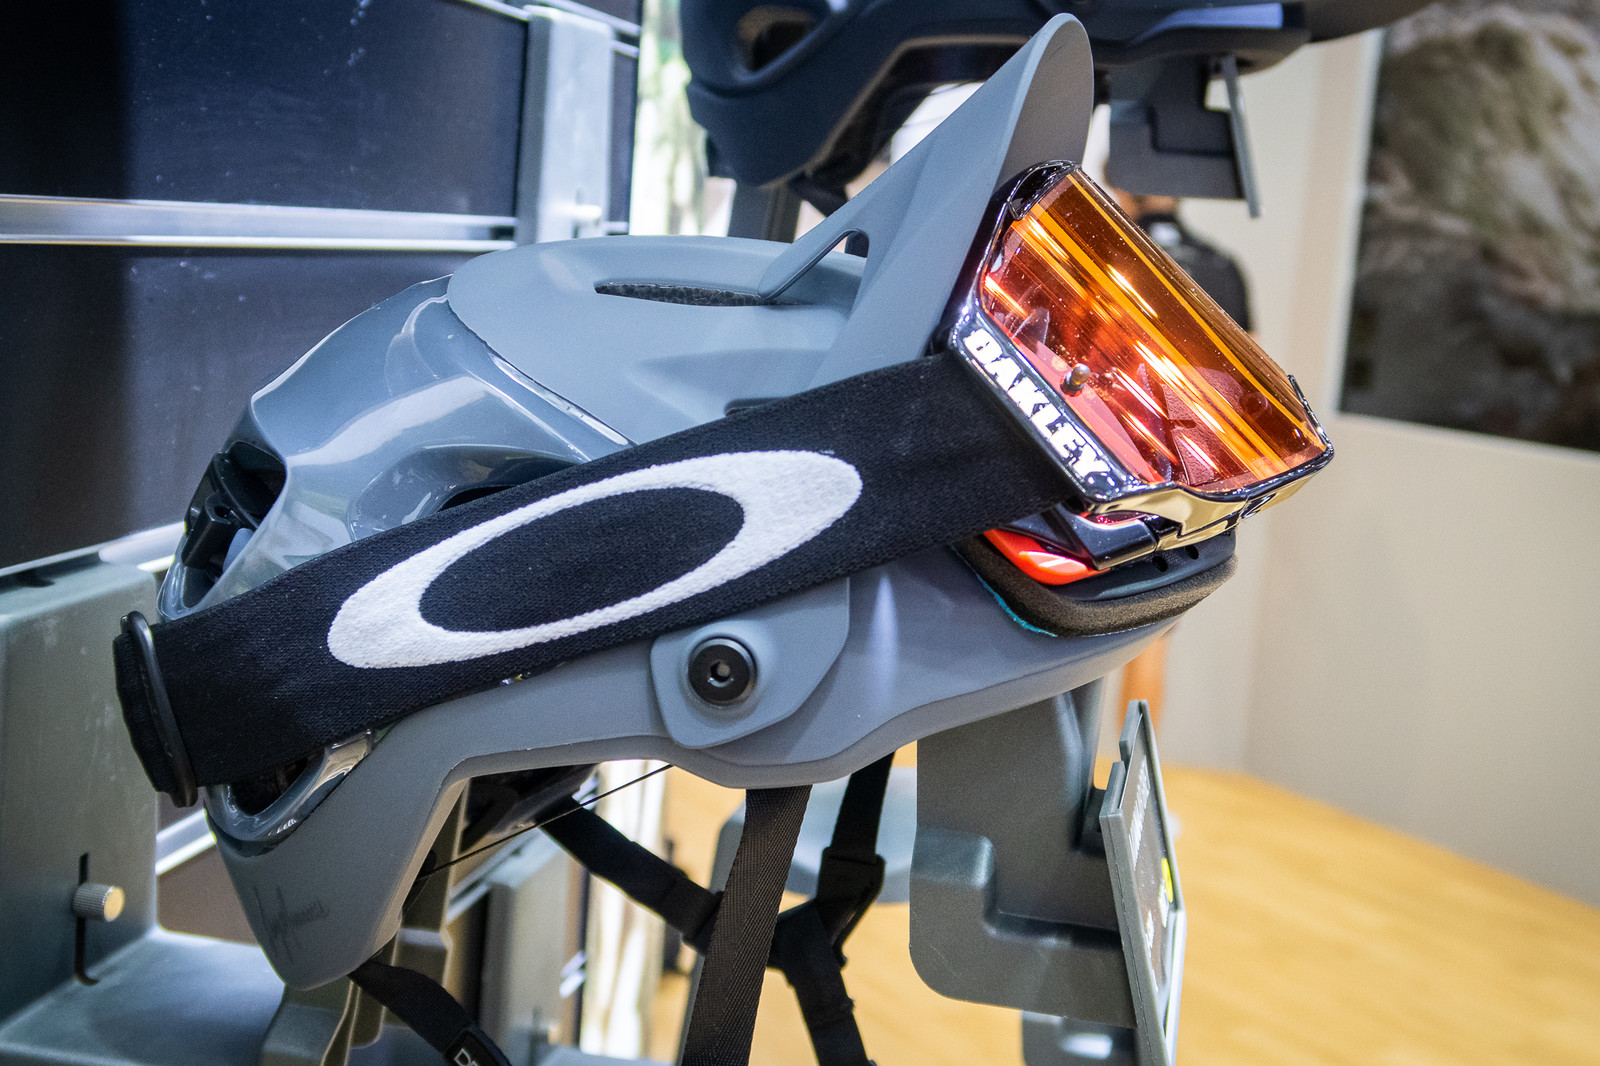 048823f5bebd0 Oakley DRT 5 Helmet at Eurobike 2018 - Mountain Bikes Feature ...